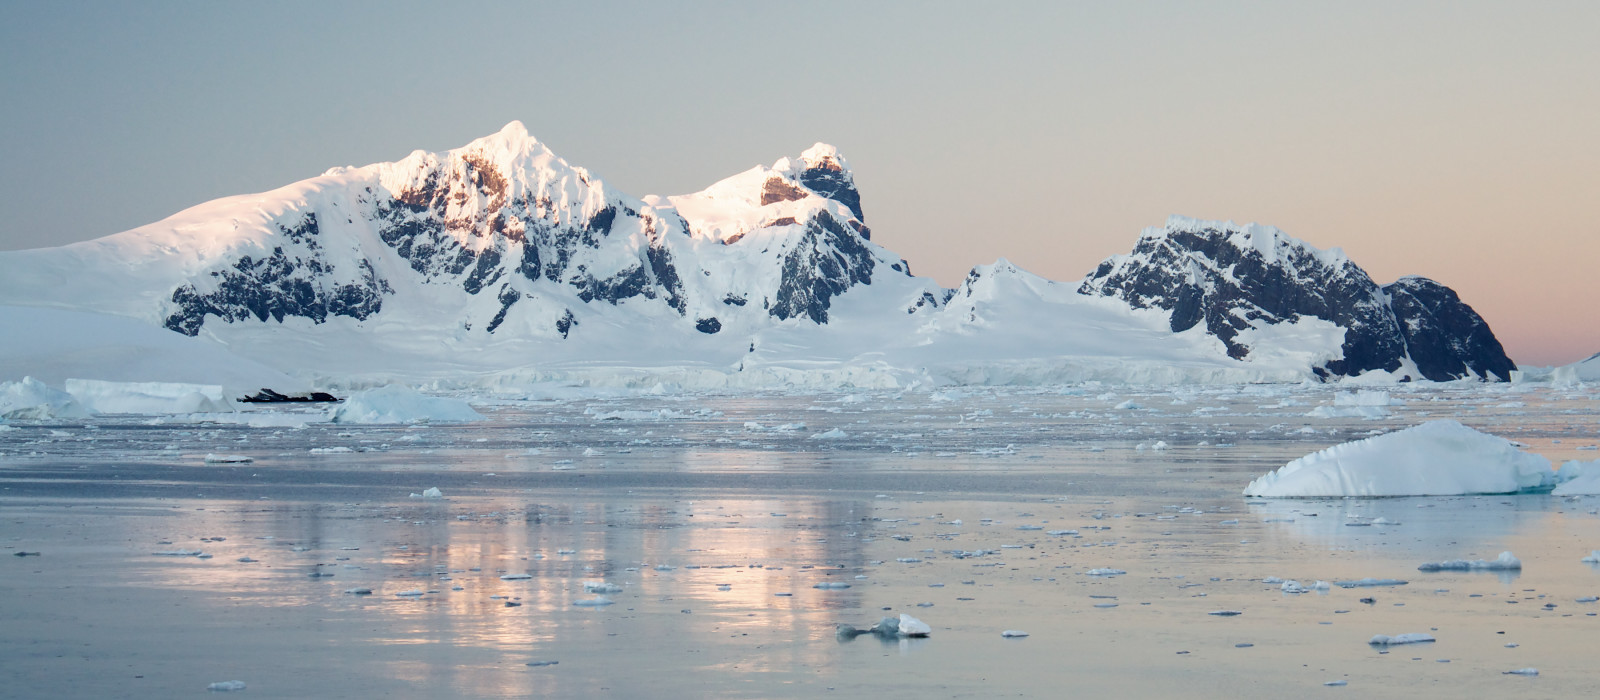 Sunrise over antarctic peninsula - Things to do in Antarctica